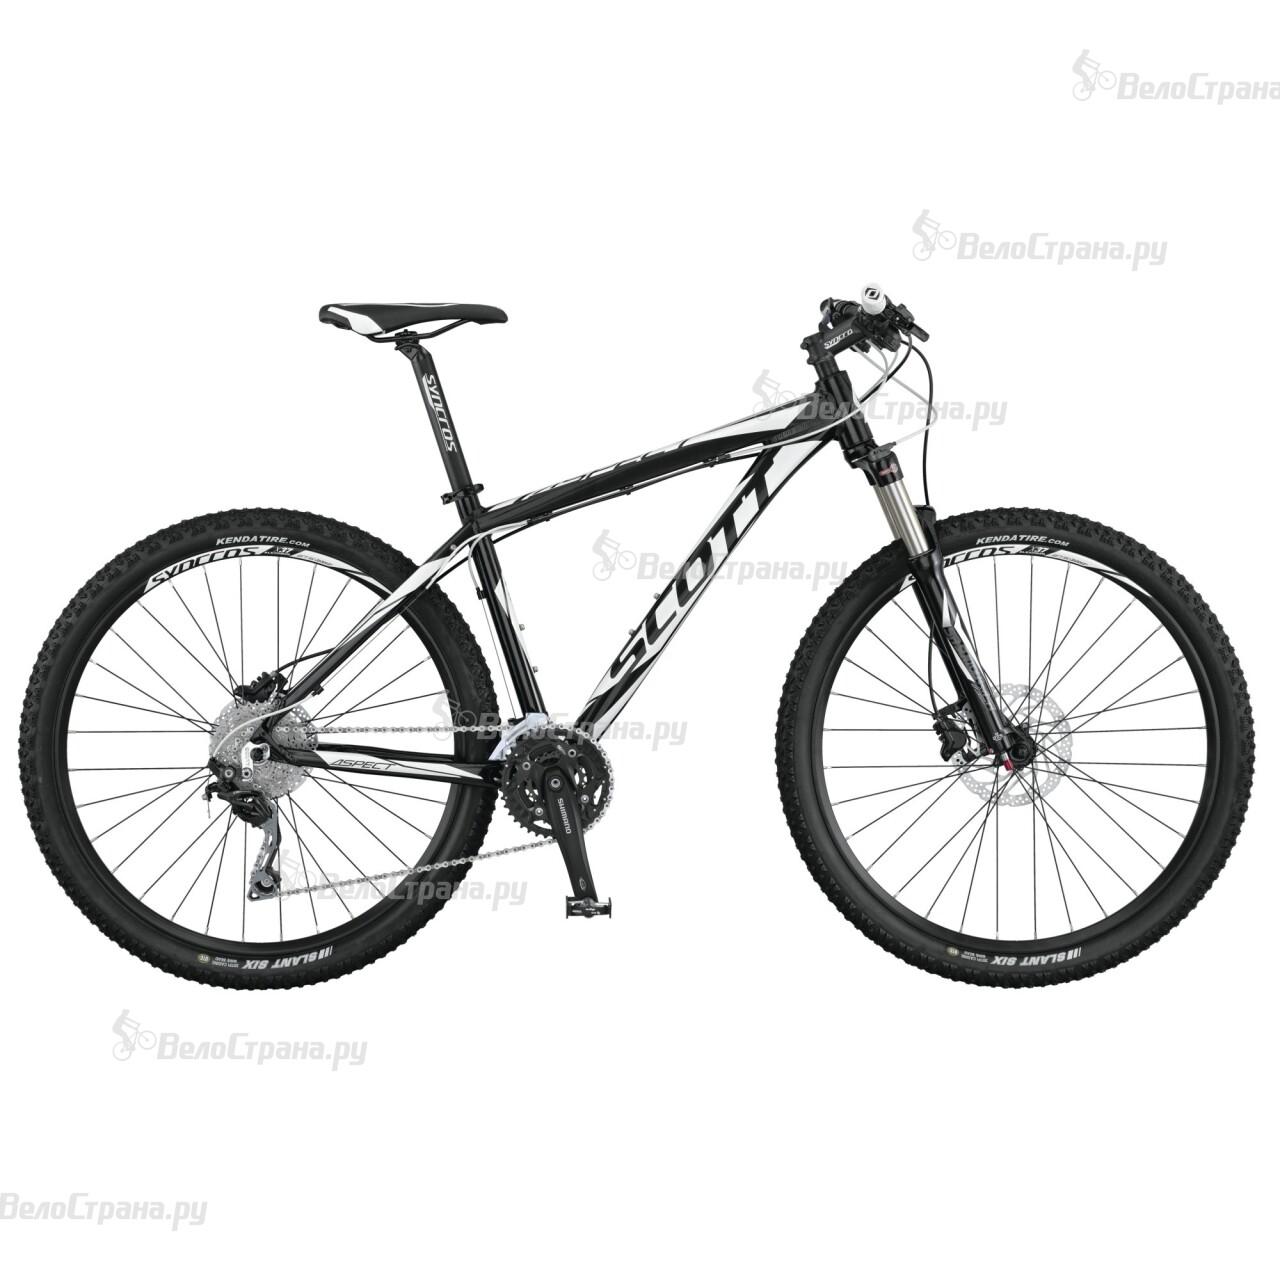 Велосипед Scott Aspect 720 (2015) велосипед scott aspect 720 27 5 2016